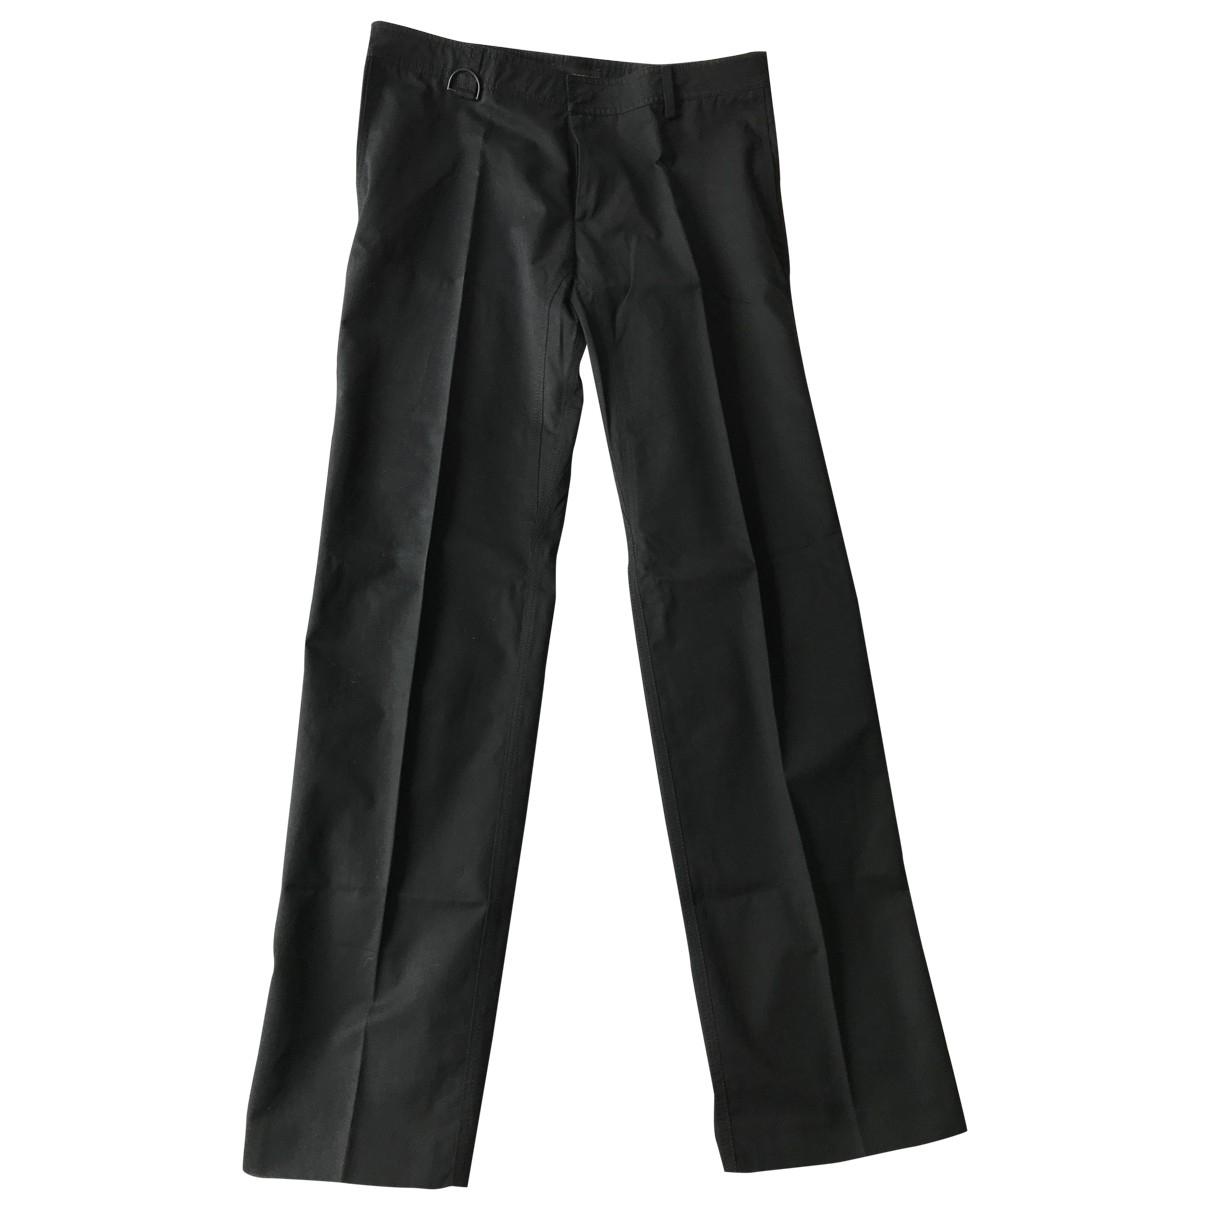 Pantalones en Algodon Negro Burberry